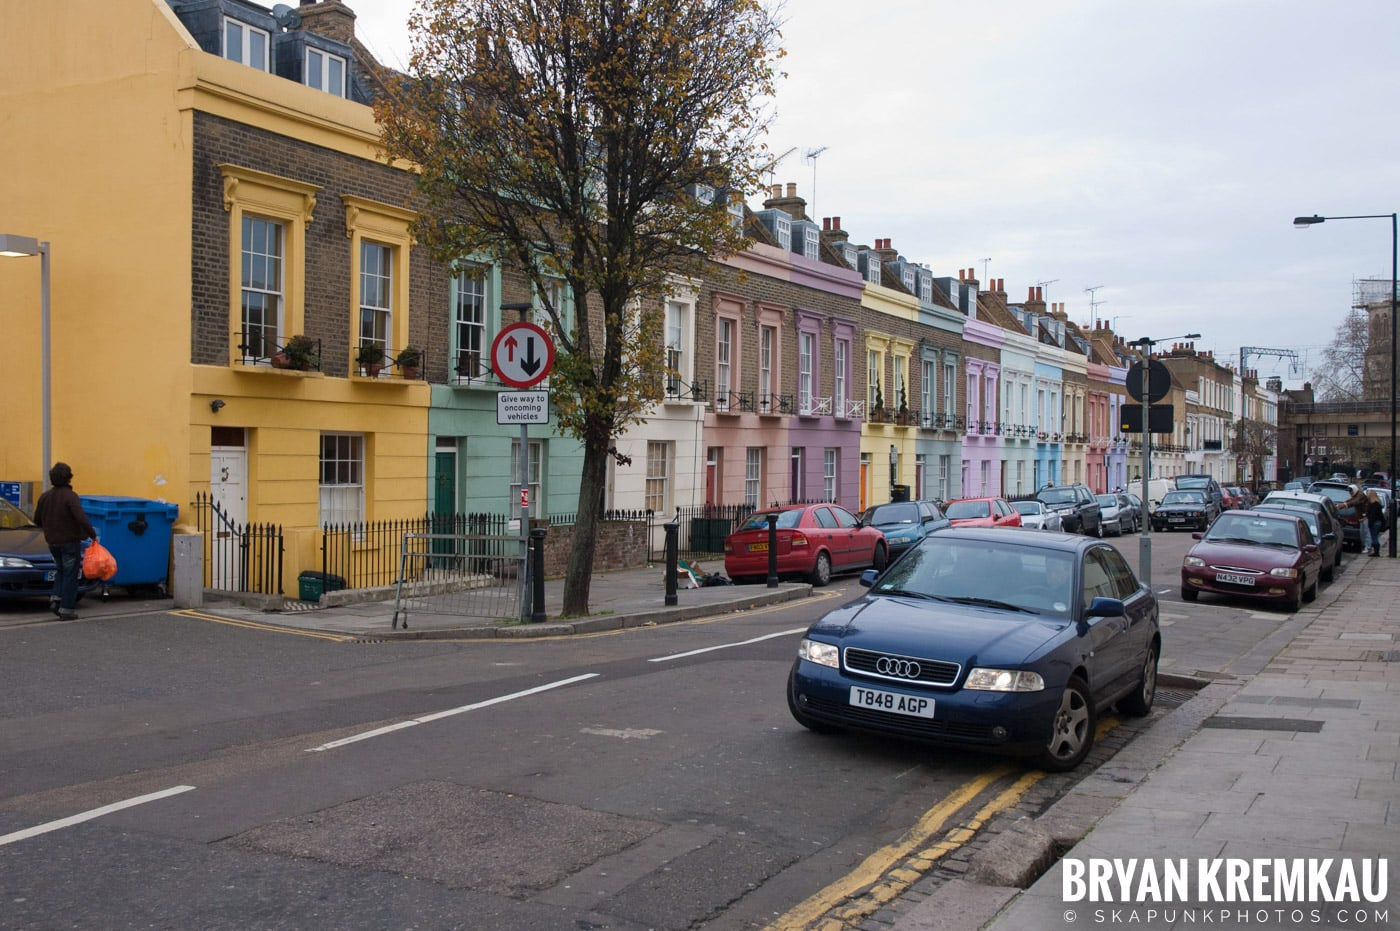 London, England - Day 3 - 12.10.06 (7)